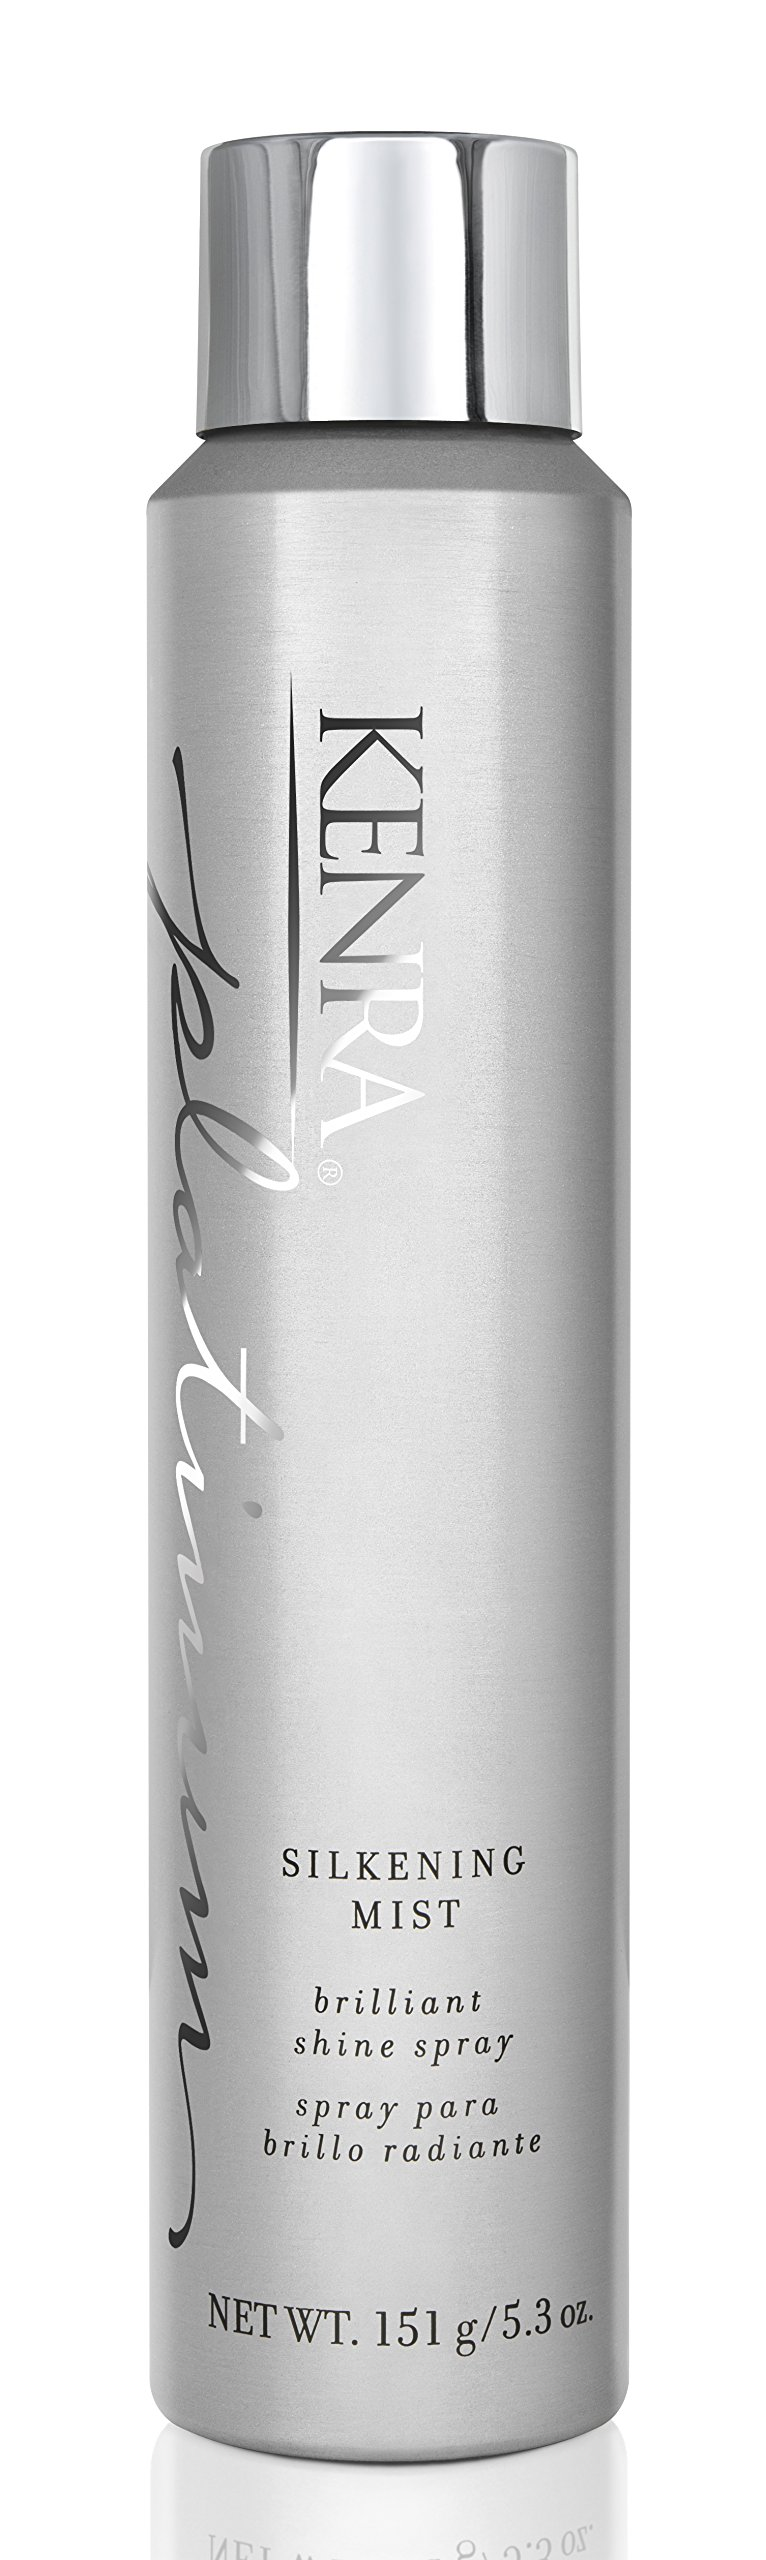 Kenra Platinum Silkening Mist Spray, 80% VOC, 5.3-Ounce